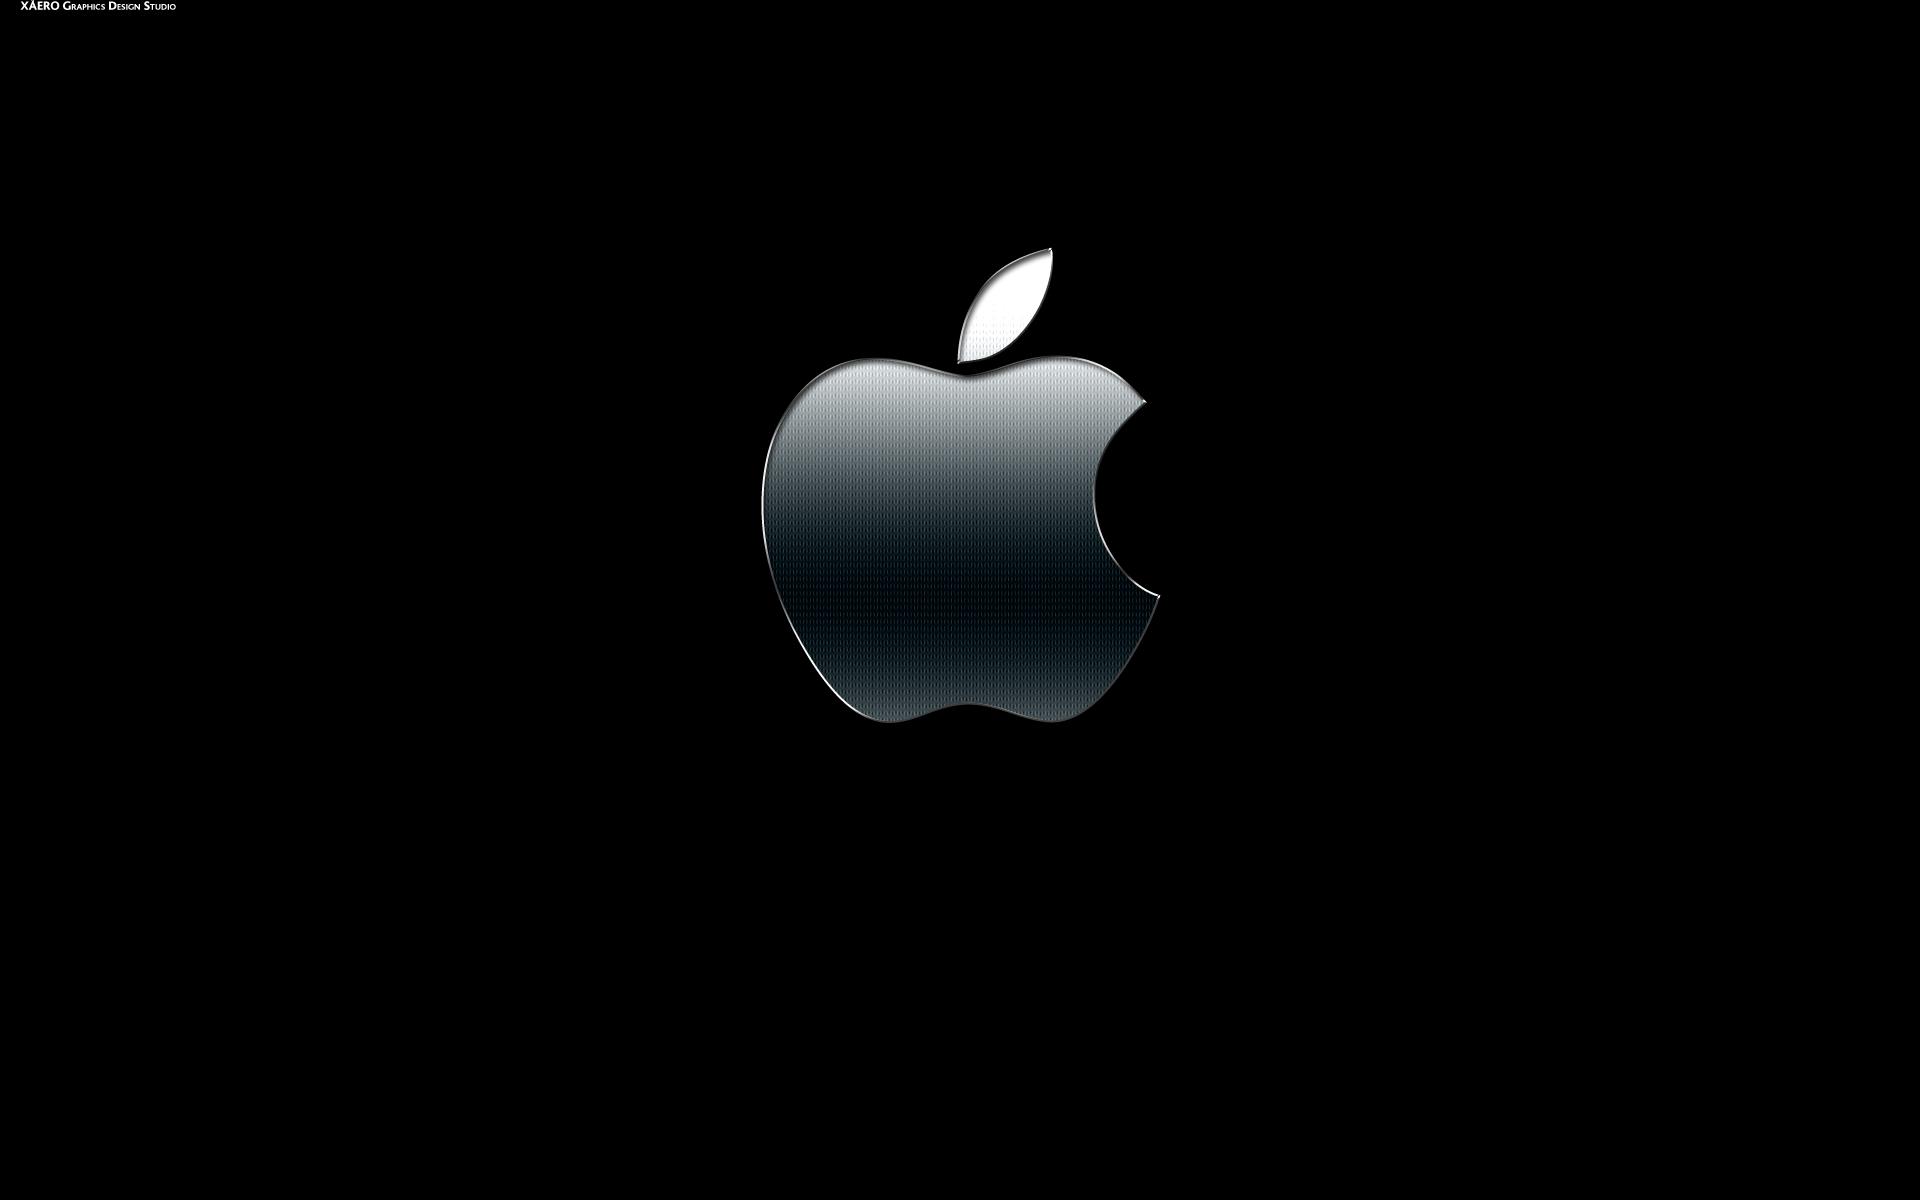 78] Apple Desktop Wallpapers on WallpaperSafari 1920x1200